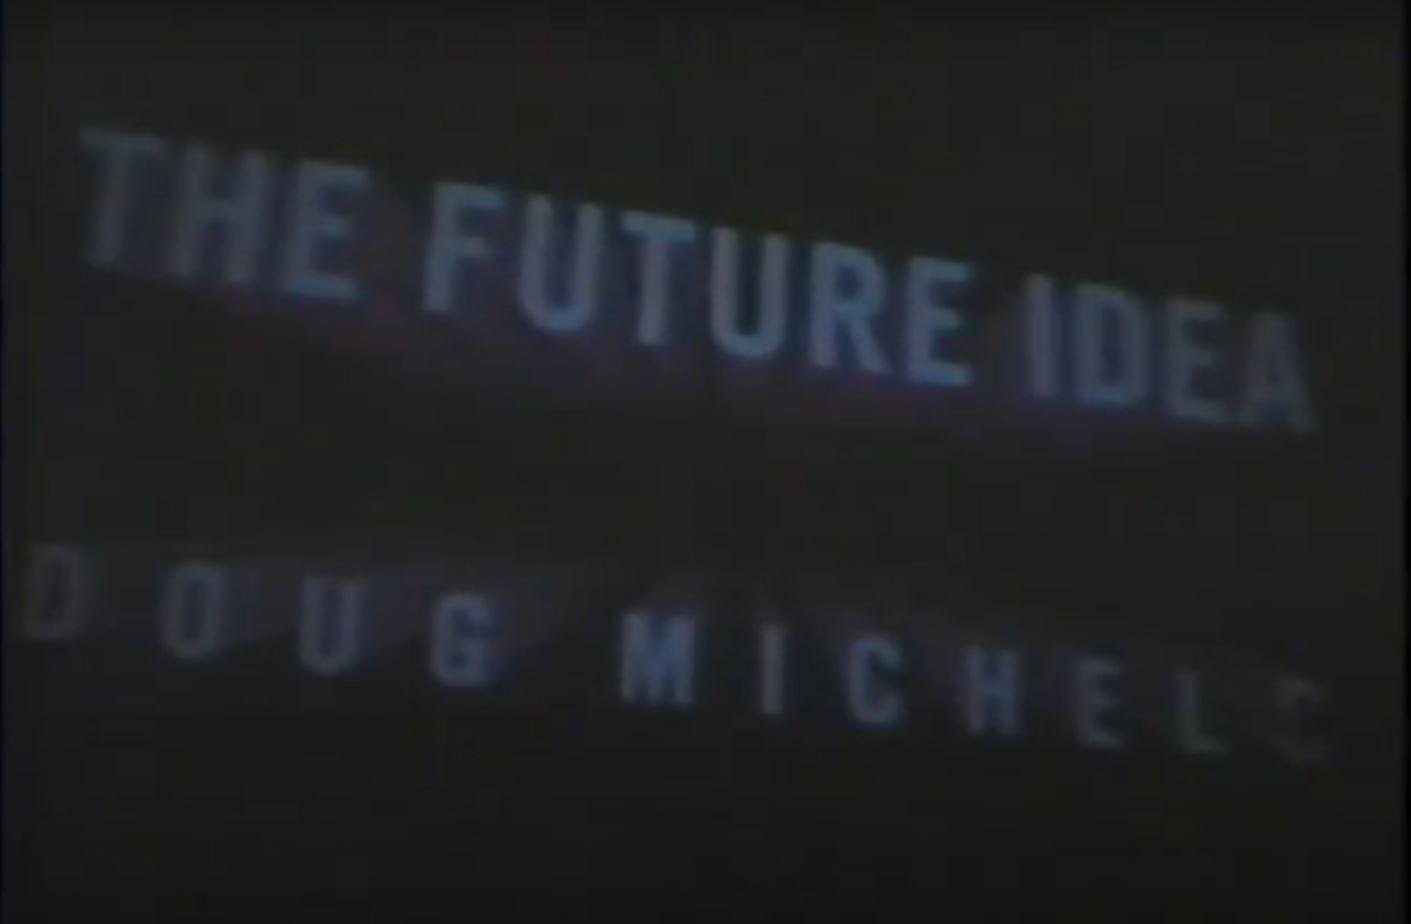 Snapshot from 'The future idea'